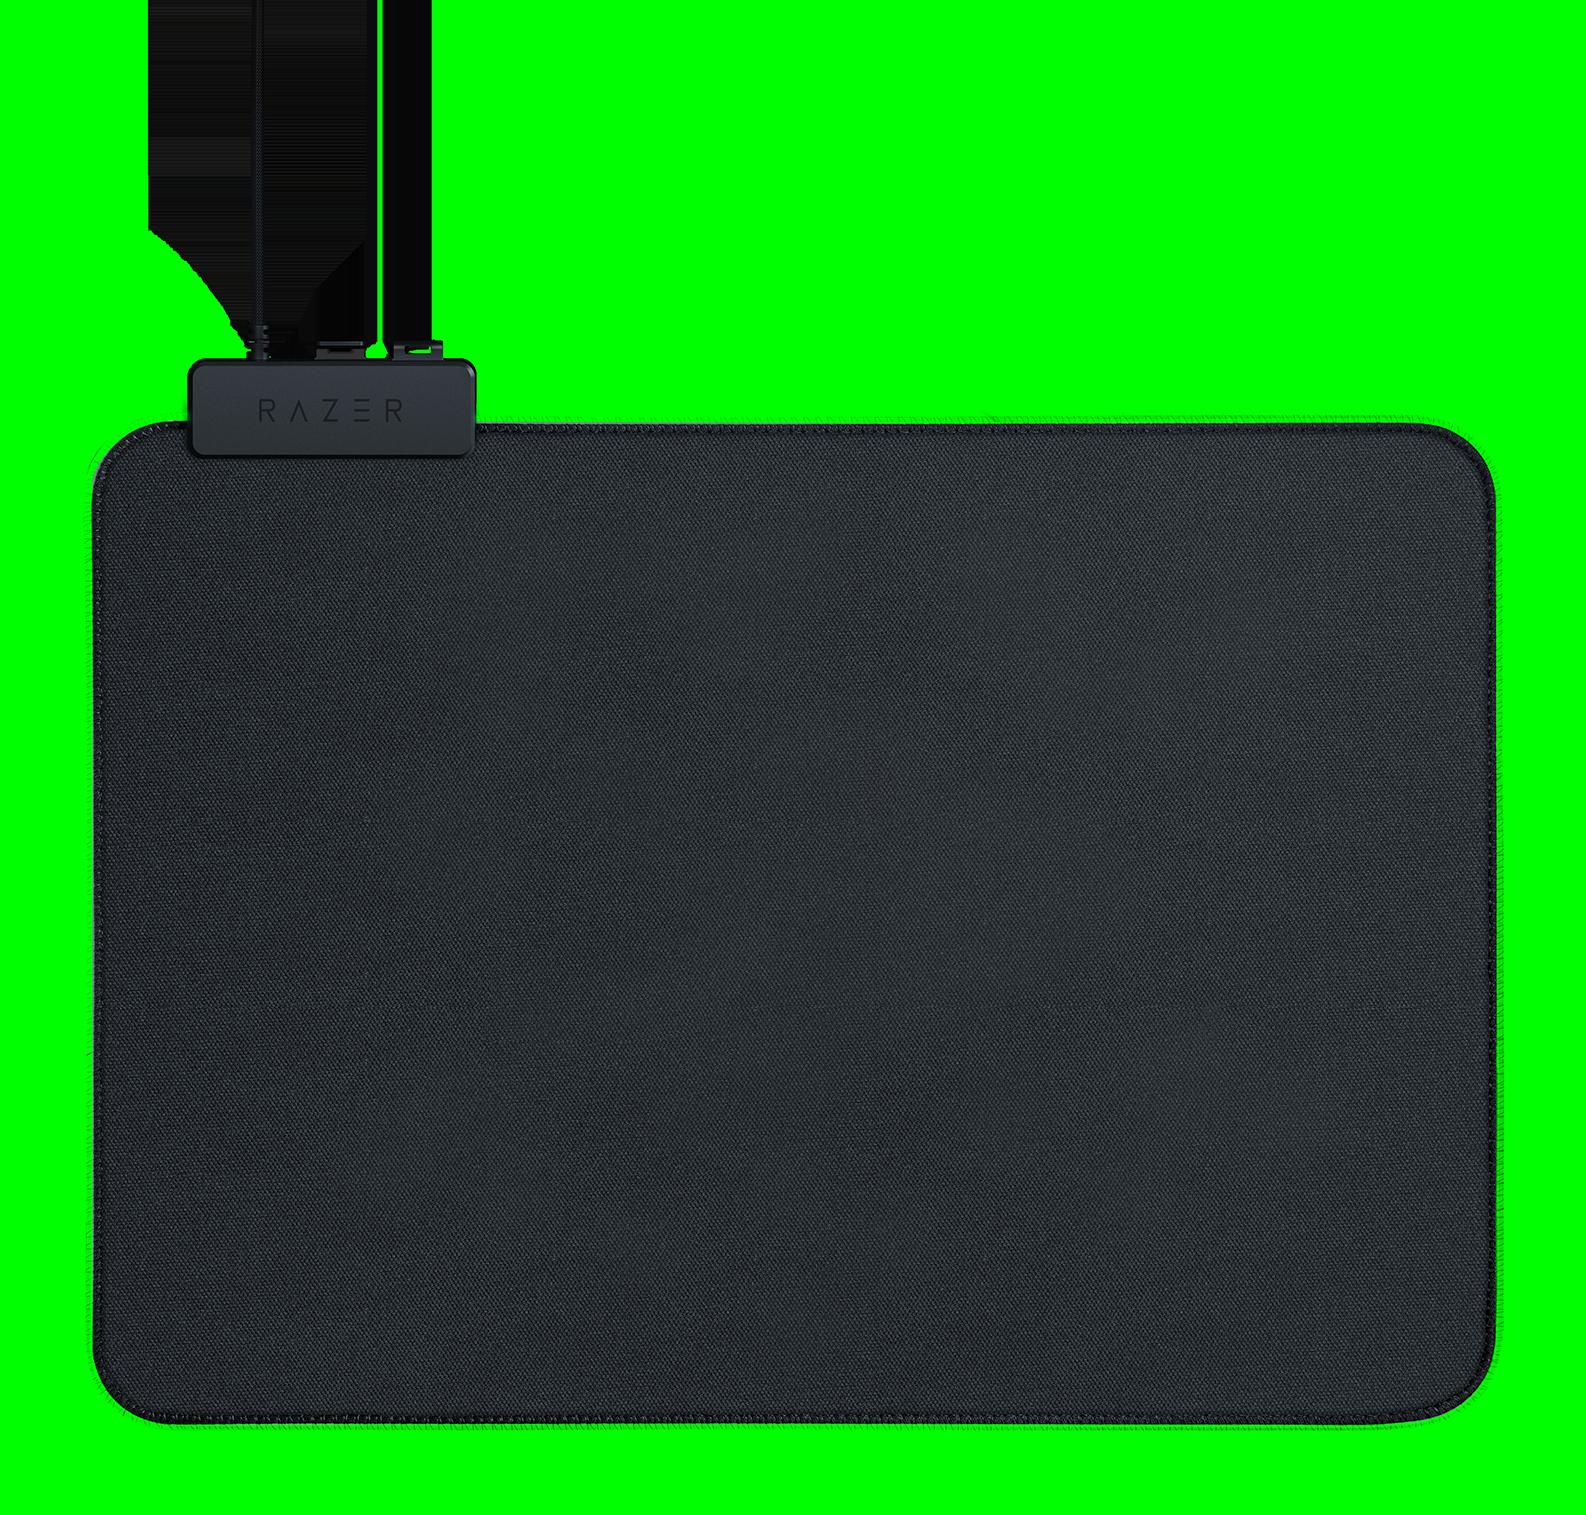 Buy Razer Goliathus Chroma Gaming Mouse Mat Microsoft Store